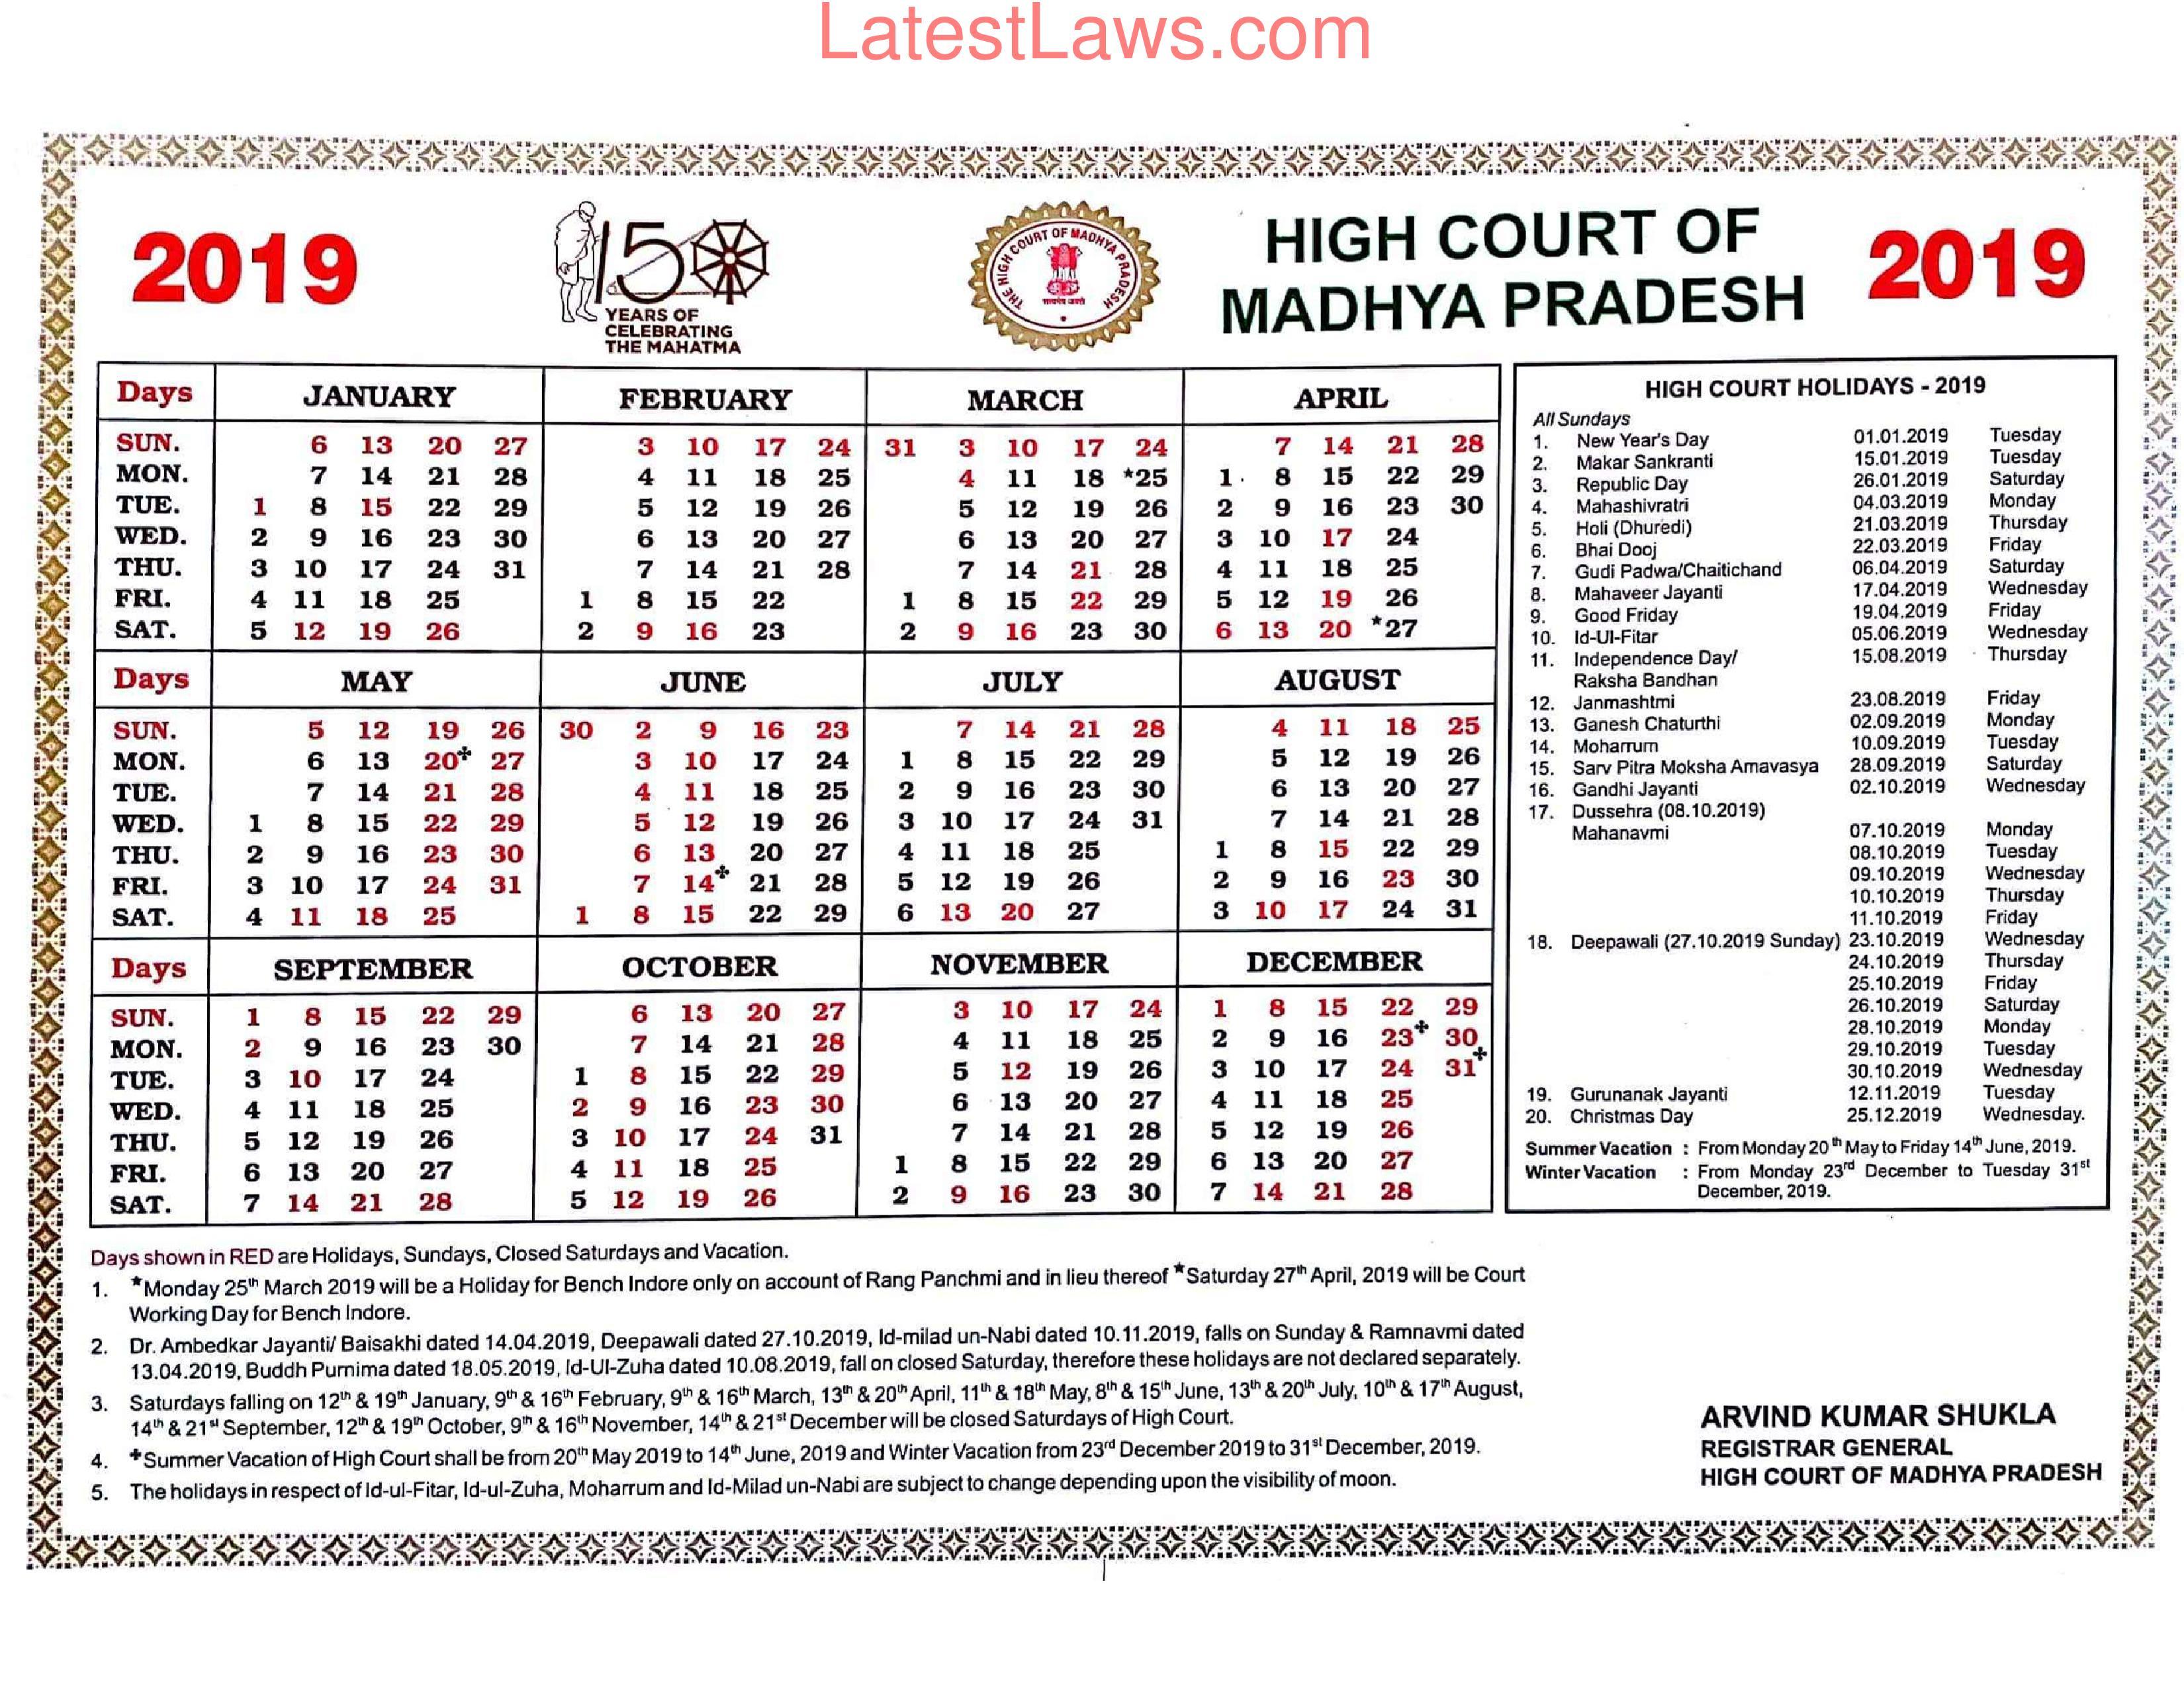 Madhya Pradesh High Court Calendar 2019 intended for Bihar Govt. Calendar